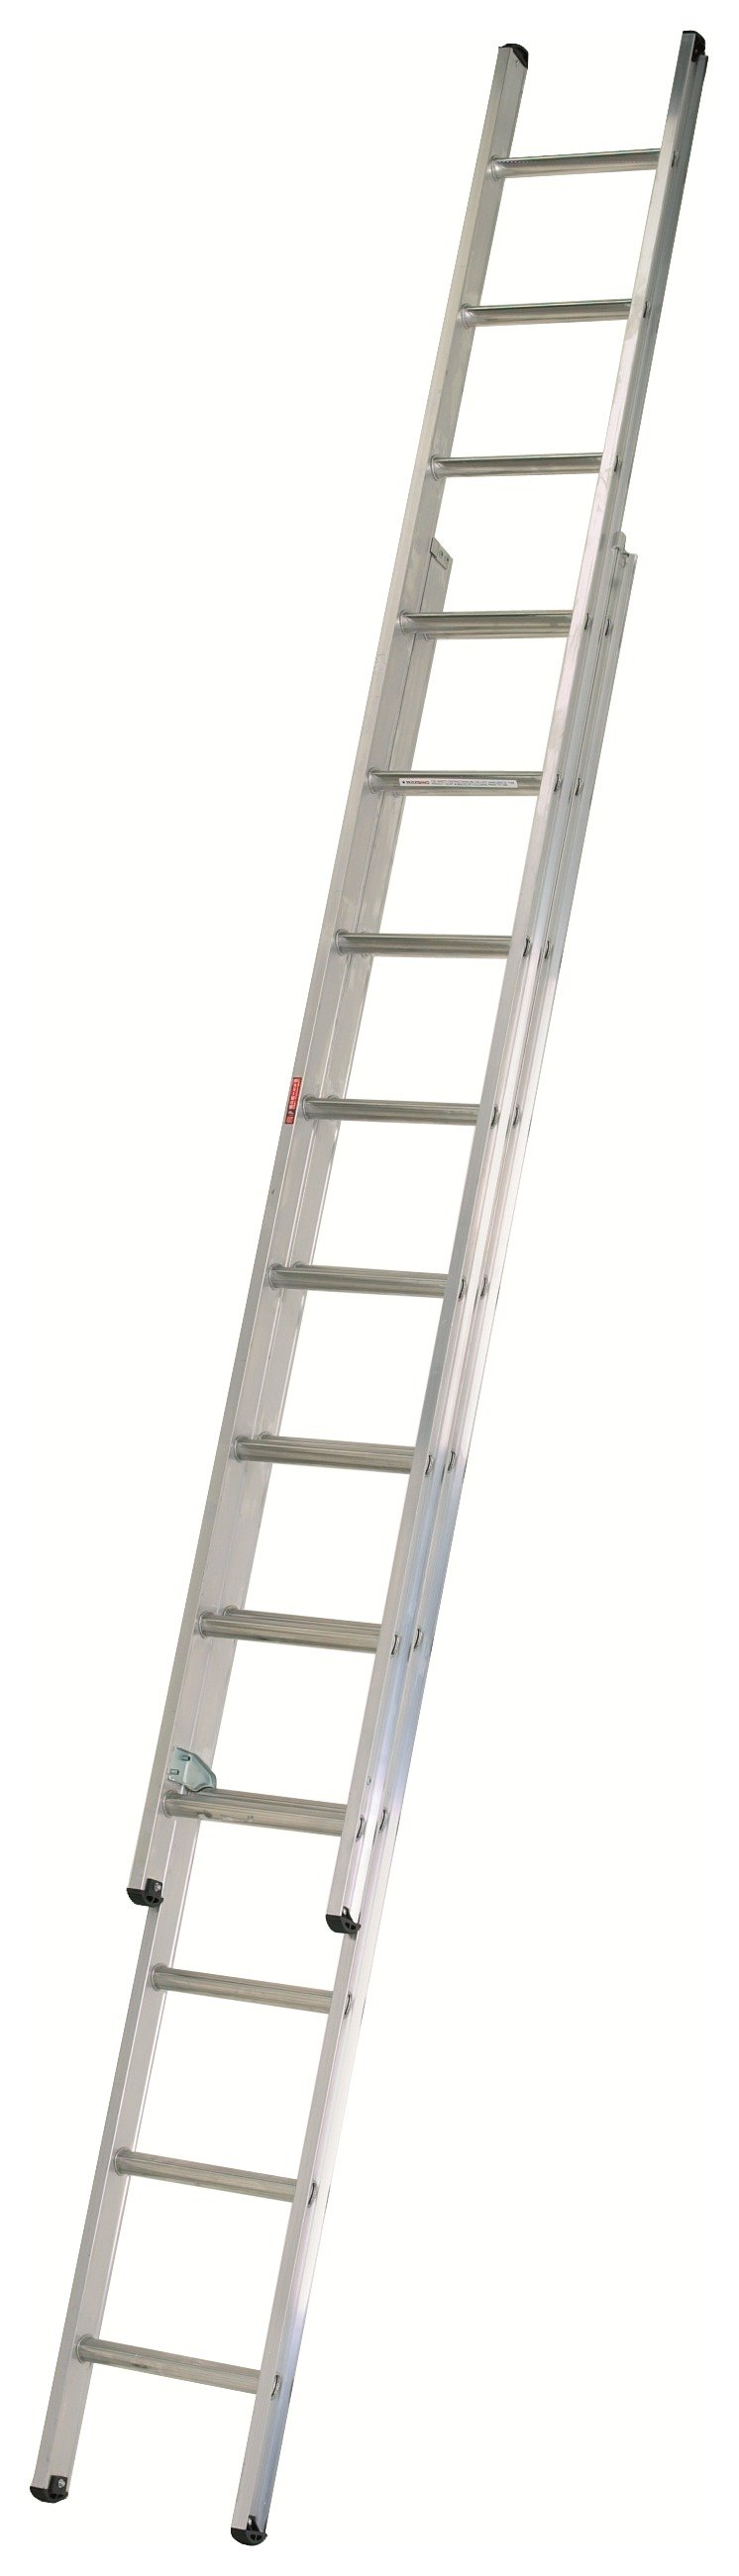 Ladders Deals On Stepladders Loft Extension Purpose